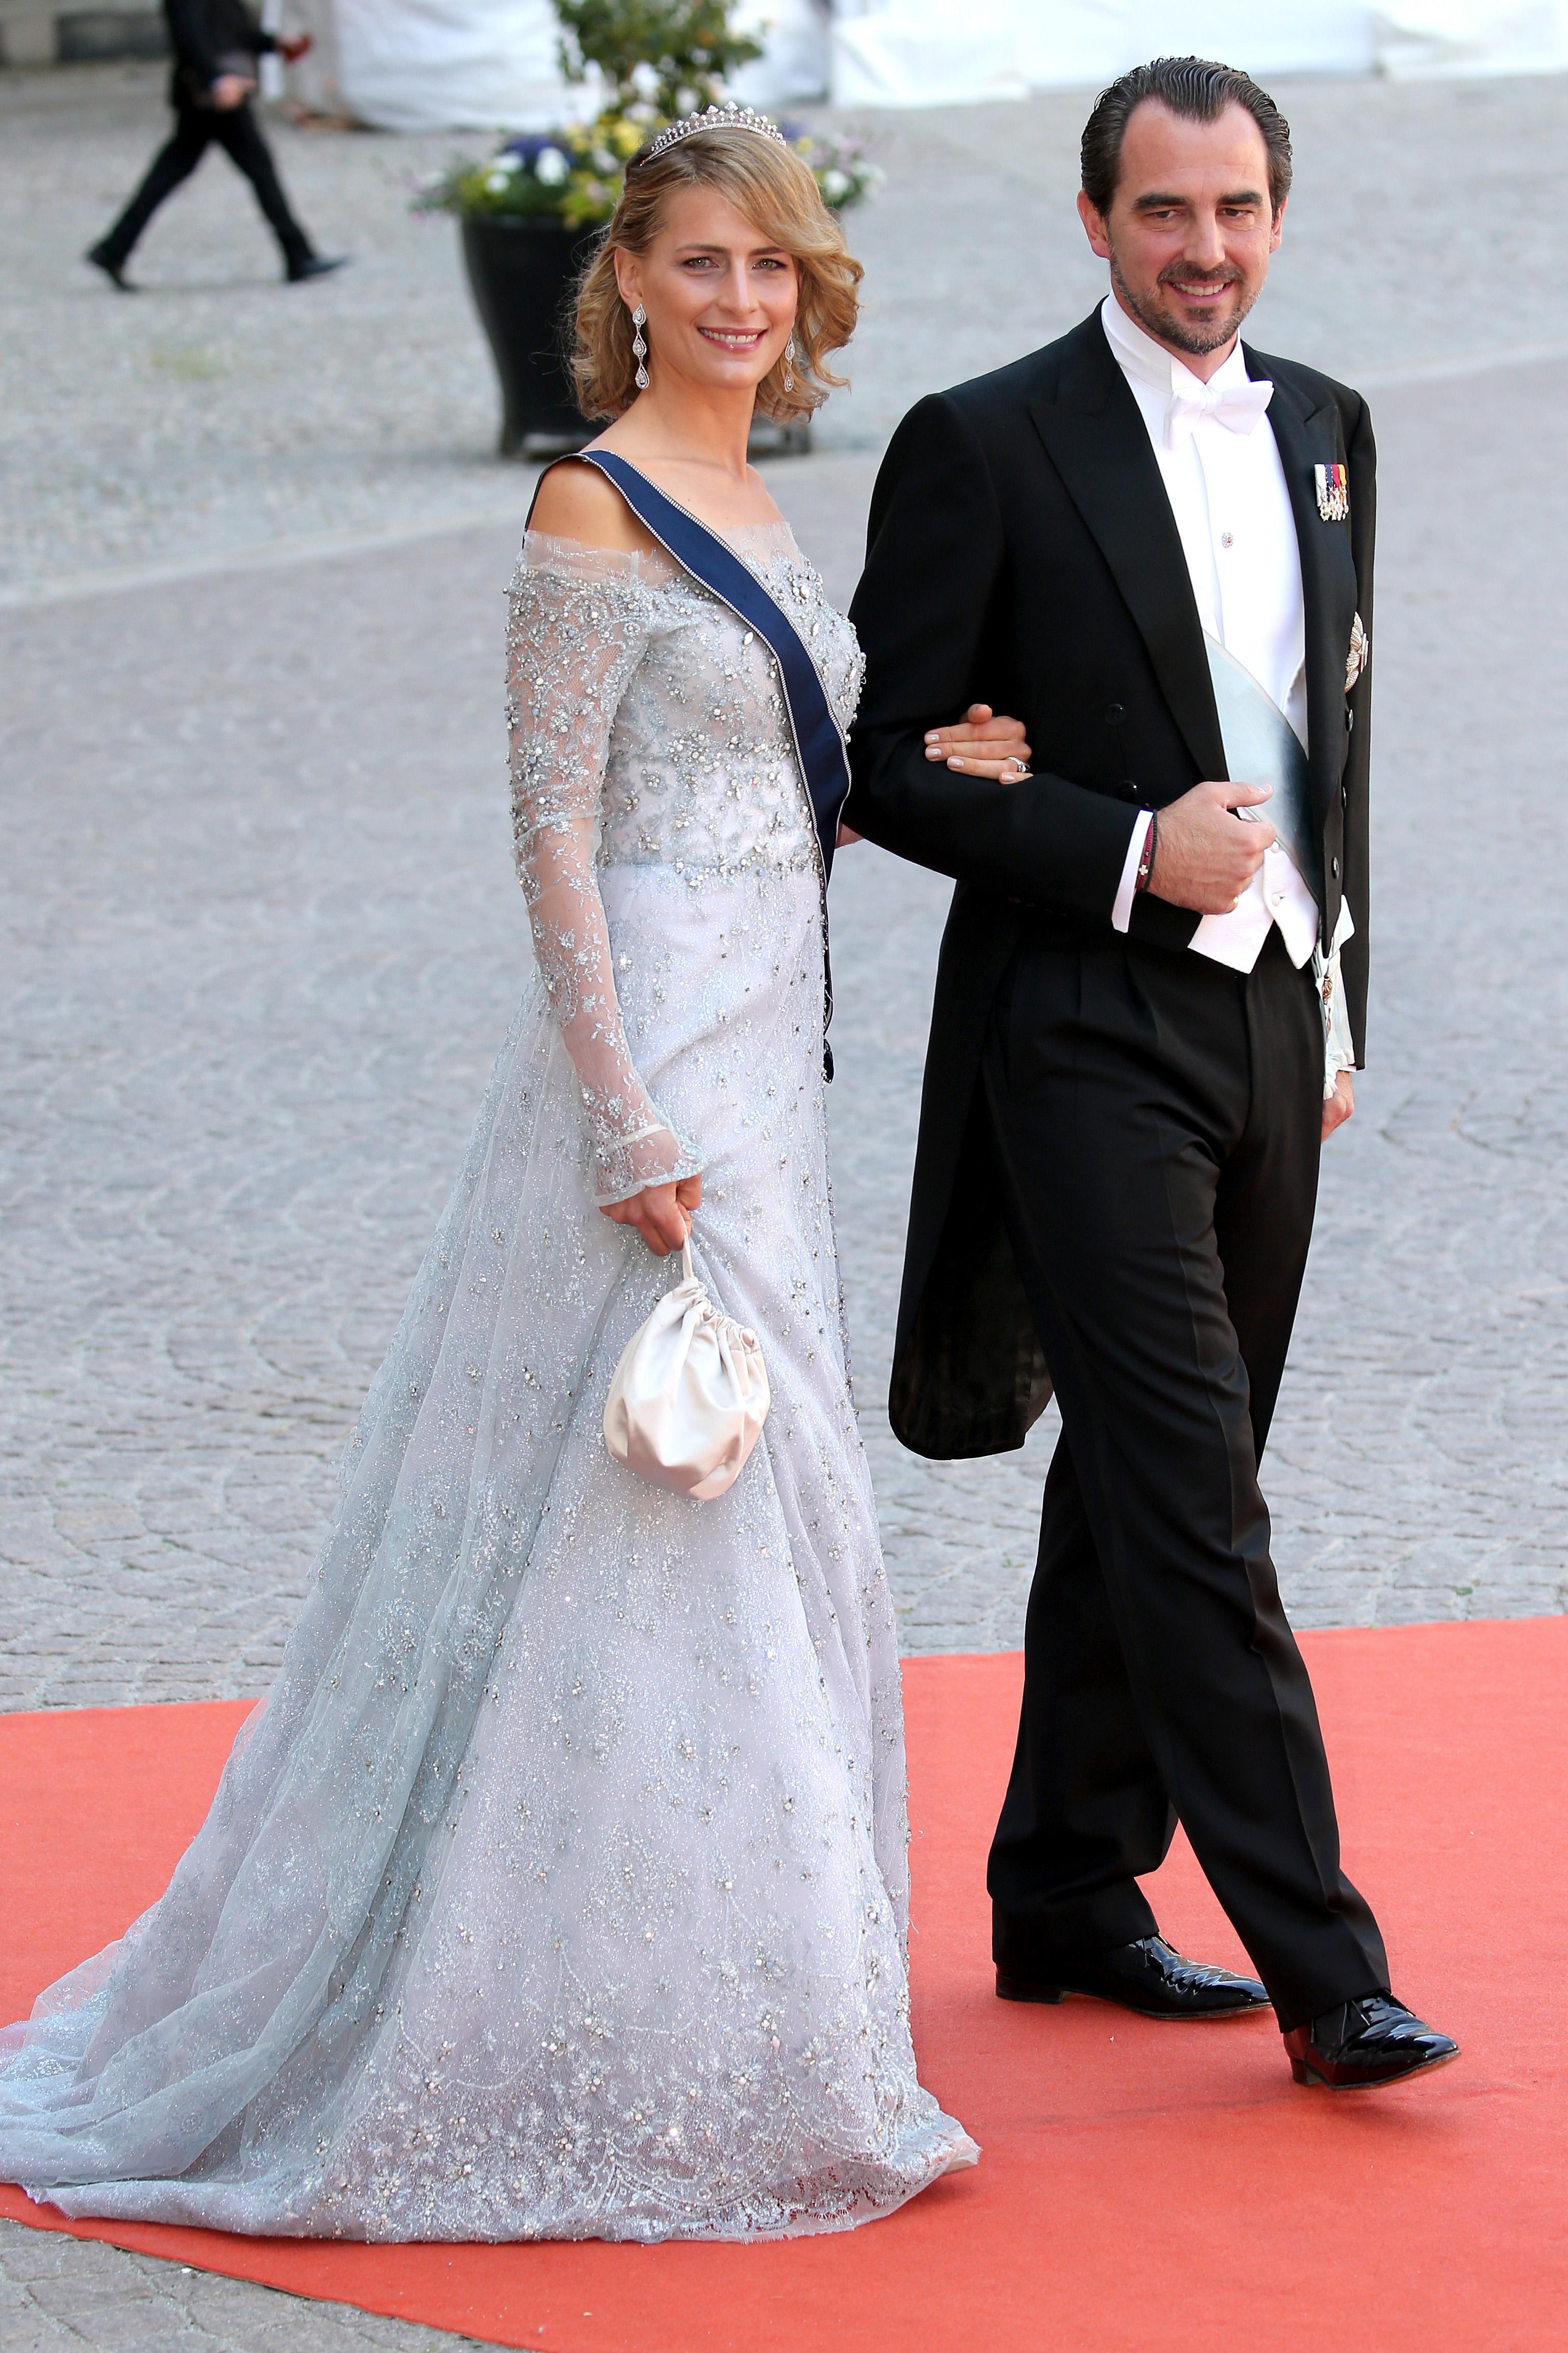 Prince Nikolaos of Greece (R) and Princess Tatiana of Greece